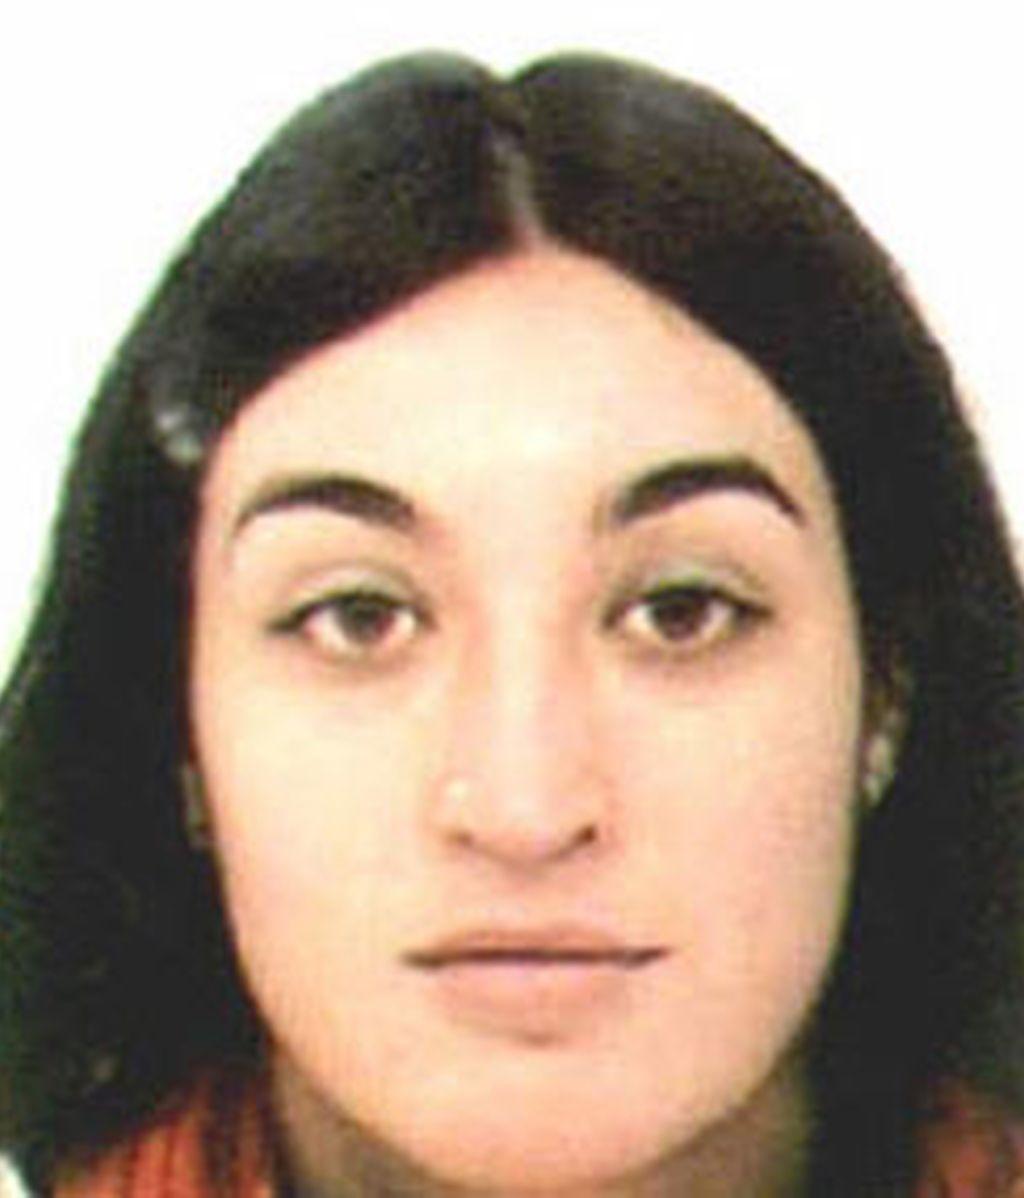 Detenida en Francia la presunta etarra Itxaso Legorburu Madinabeitia. Vídeo: Atlas